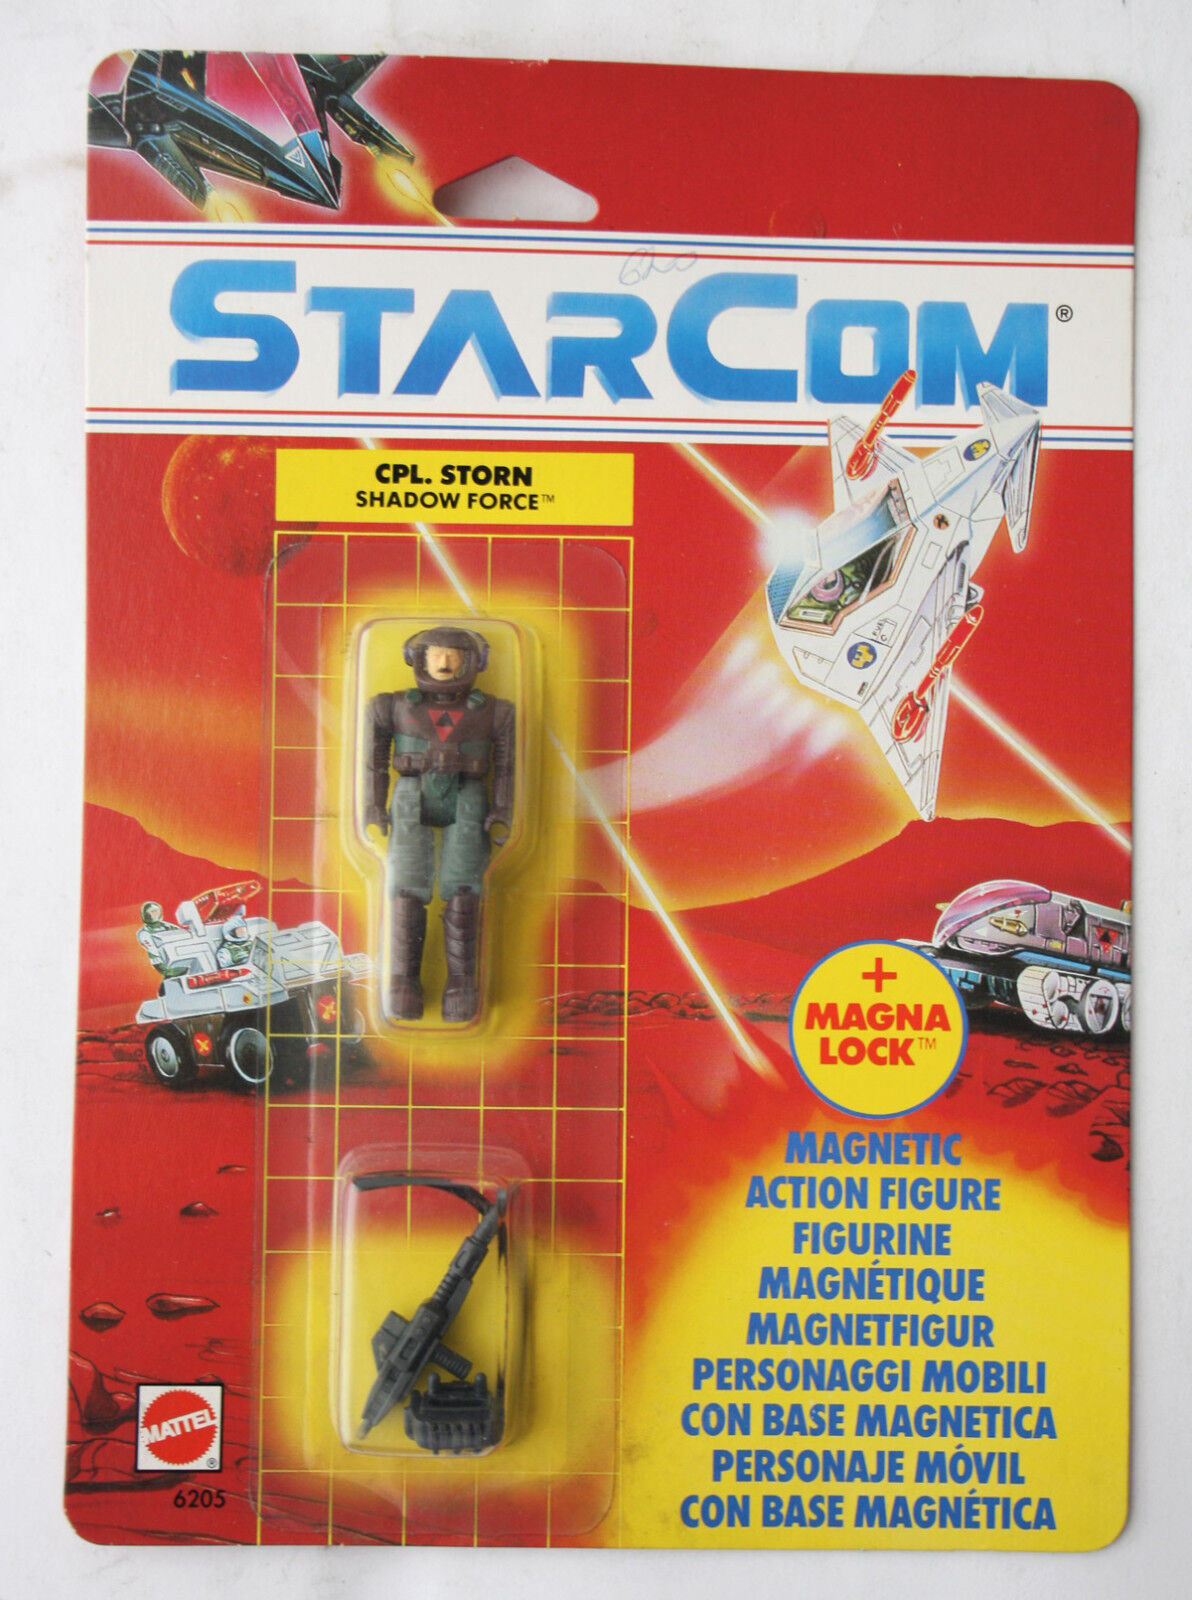 RARE VINTAGE 1990 STARCOM CPL STORN SHADOW FORCE MATTEL NEW SEALED